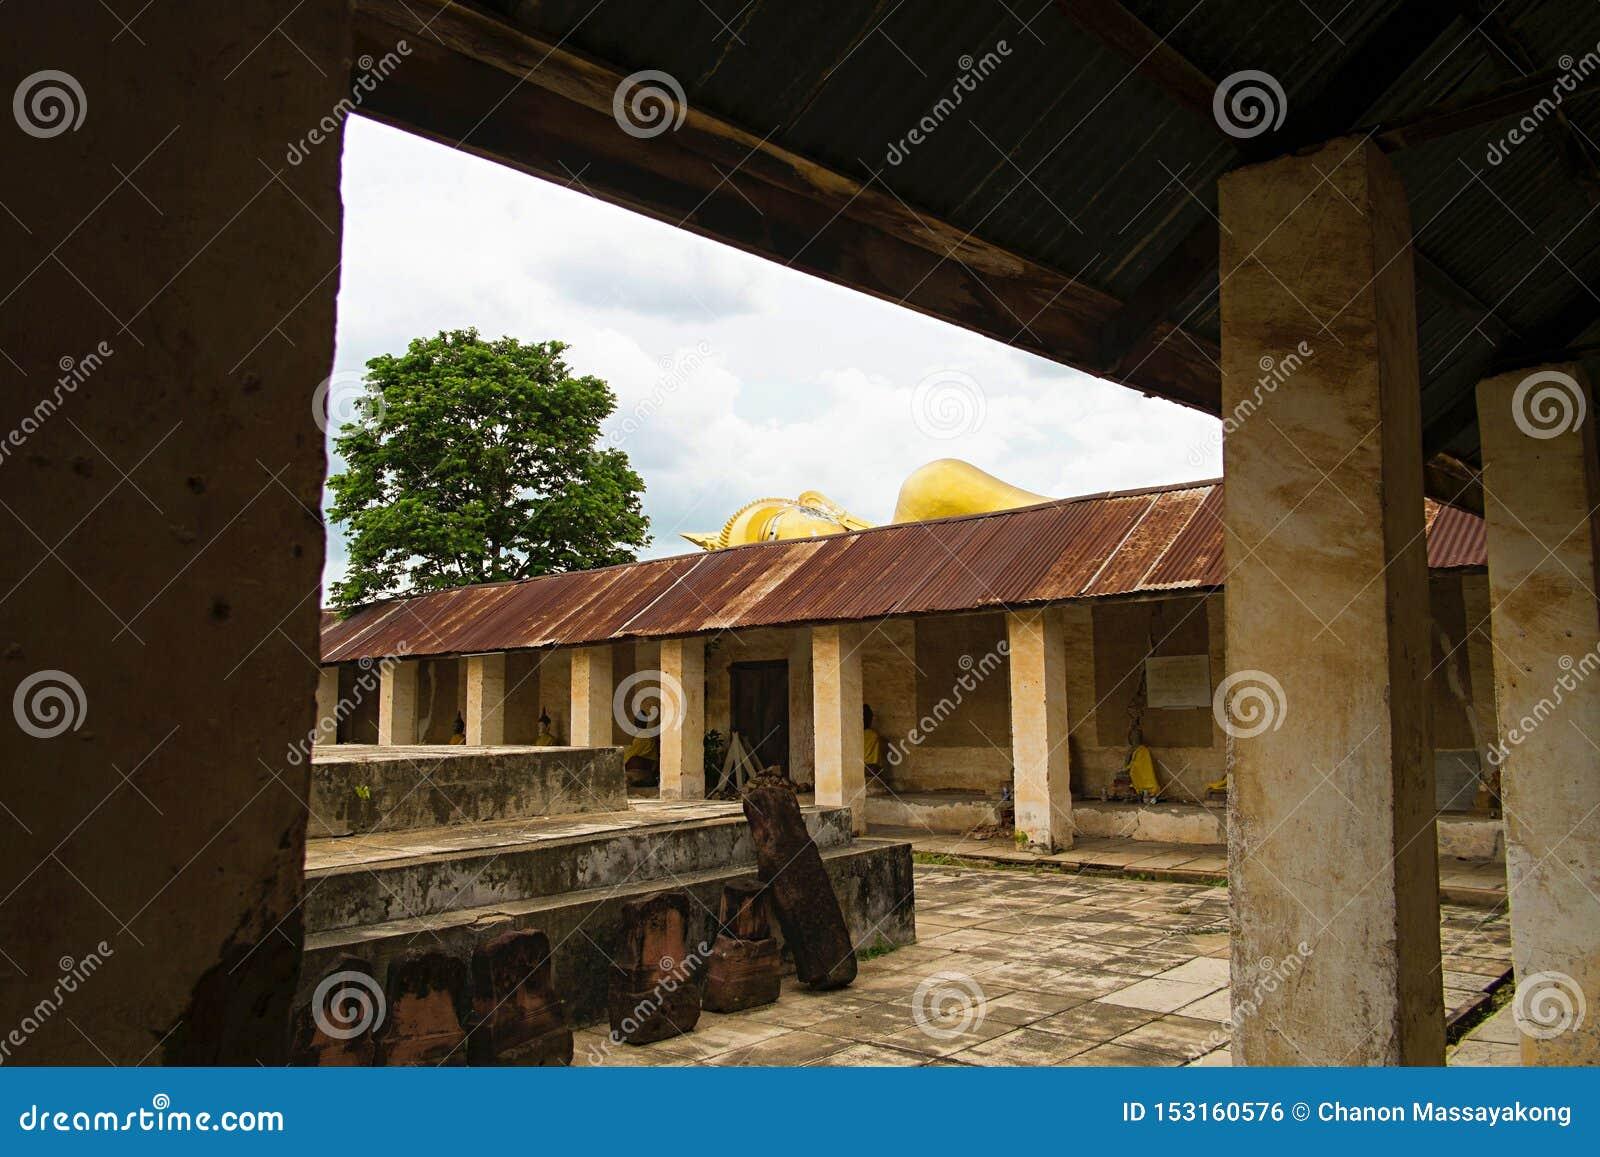 In kant van klooster oude Thaise Boeddhistische Tempel